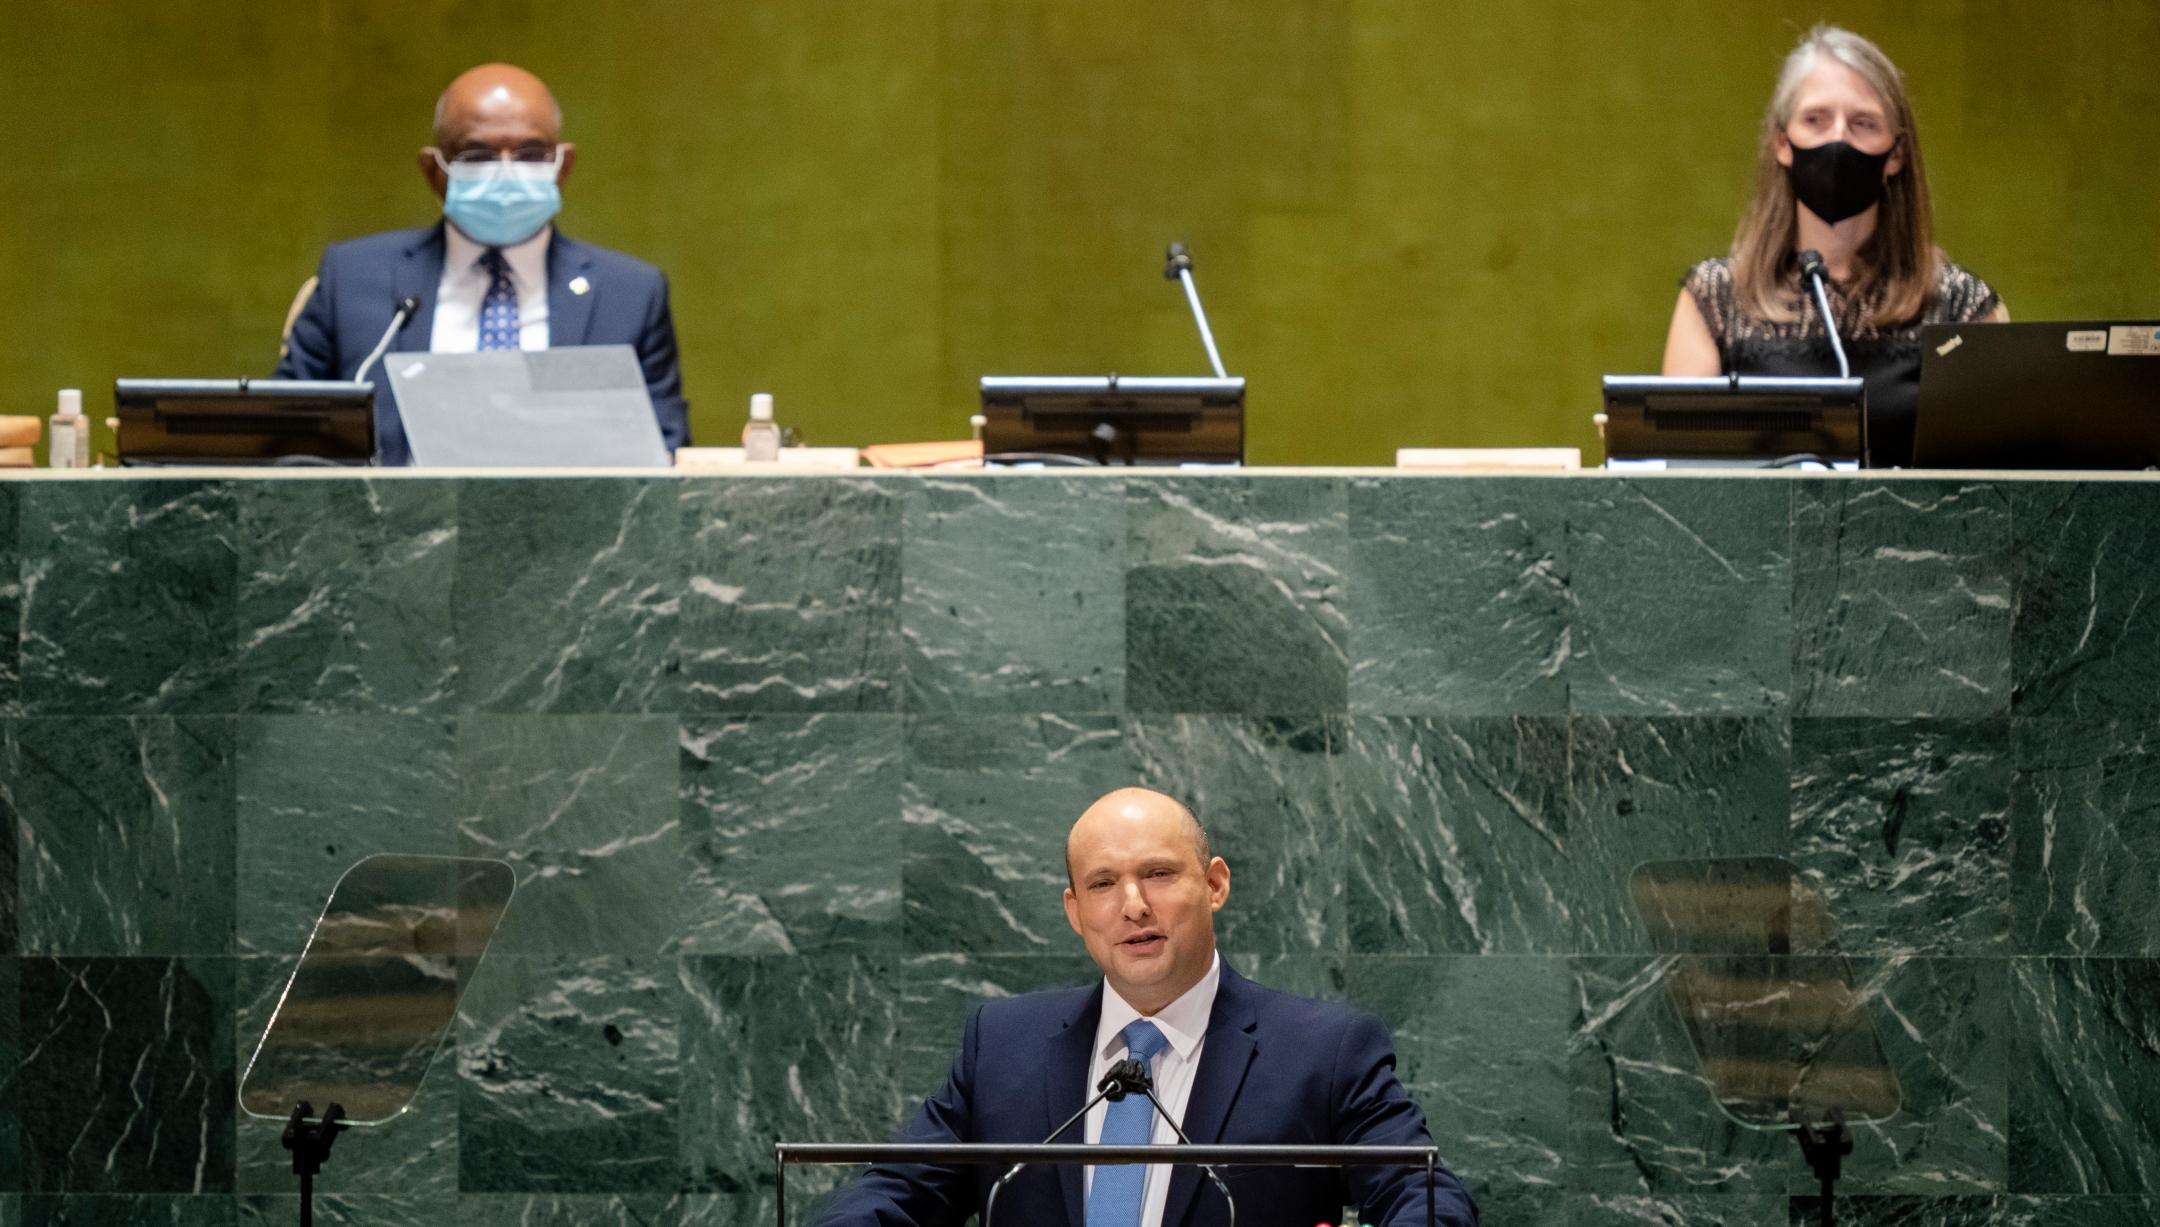 In his first UN speech, Naftali Bennett sounded different from Netanyahu